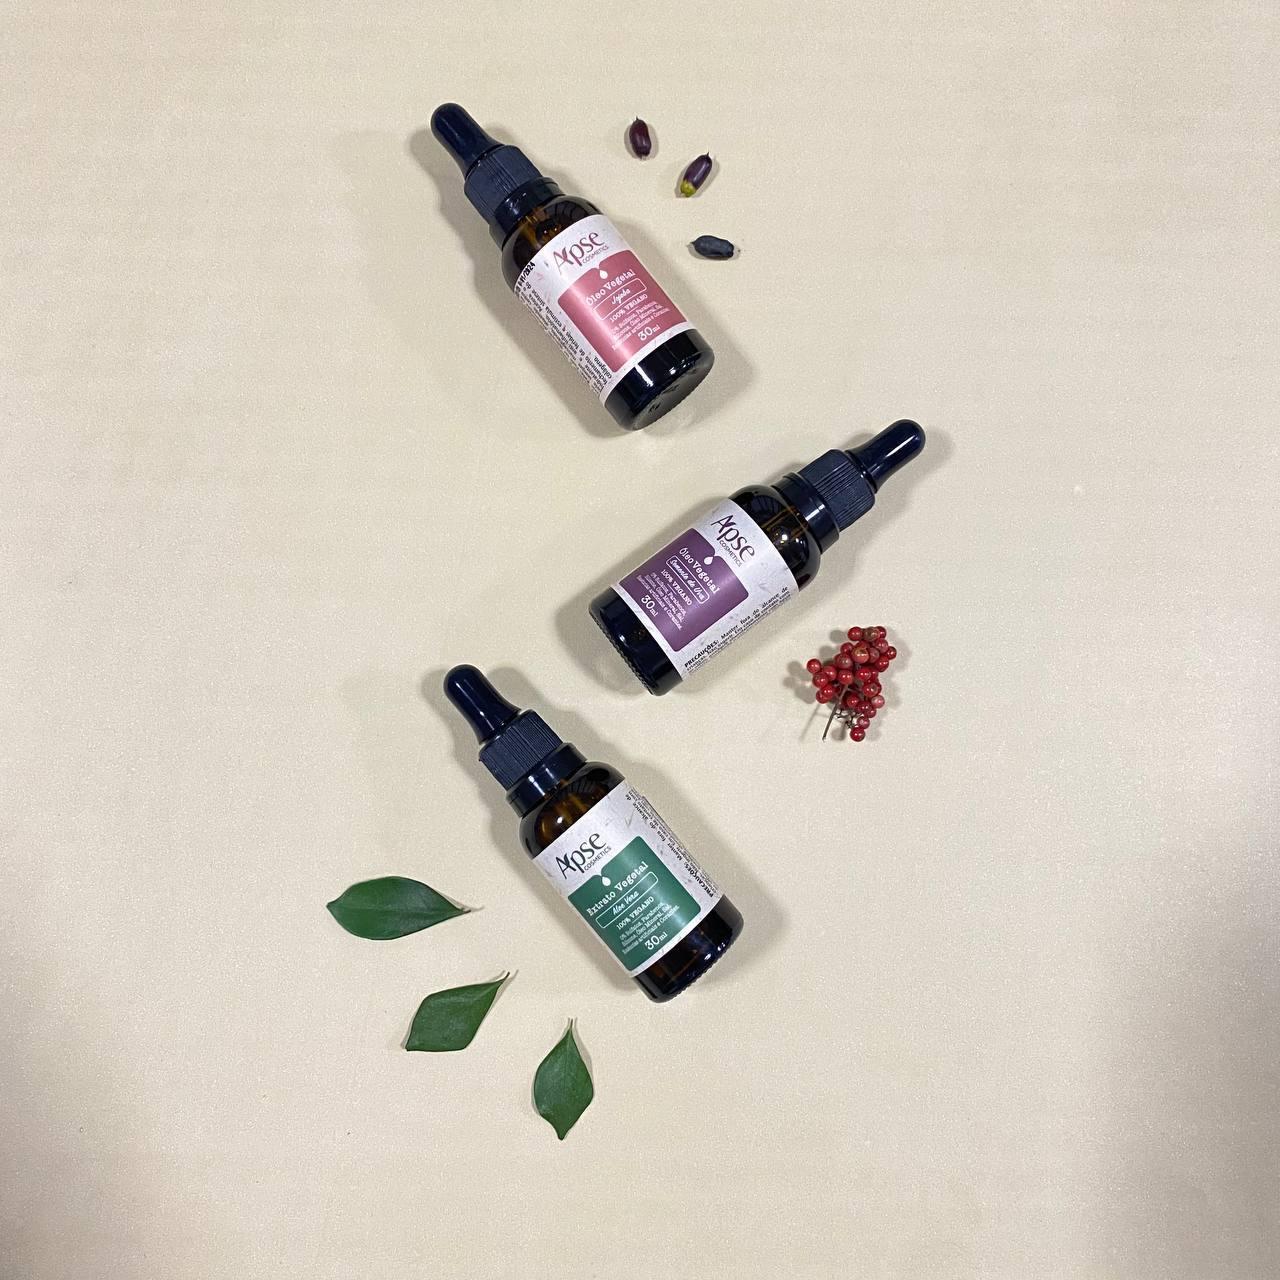 Kit Multifuncional - Apse Cosmetics